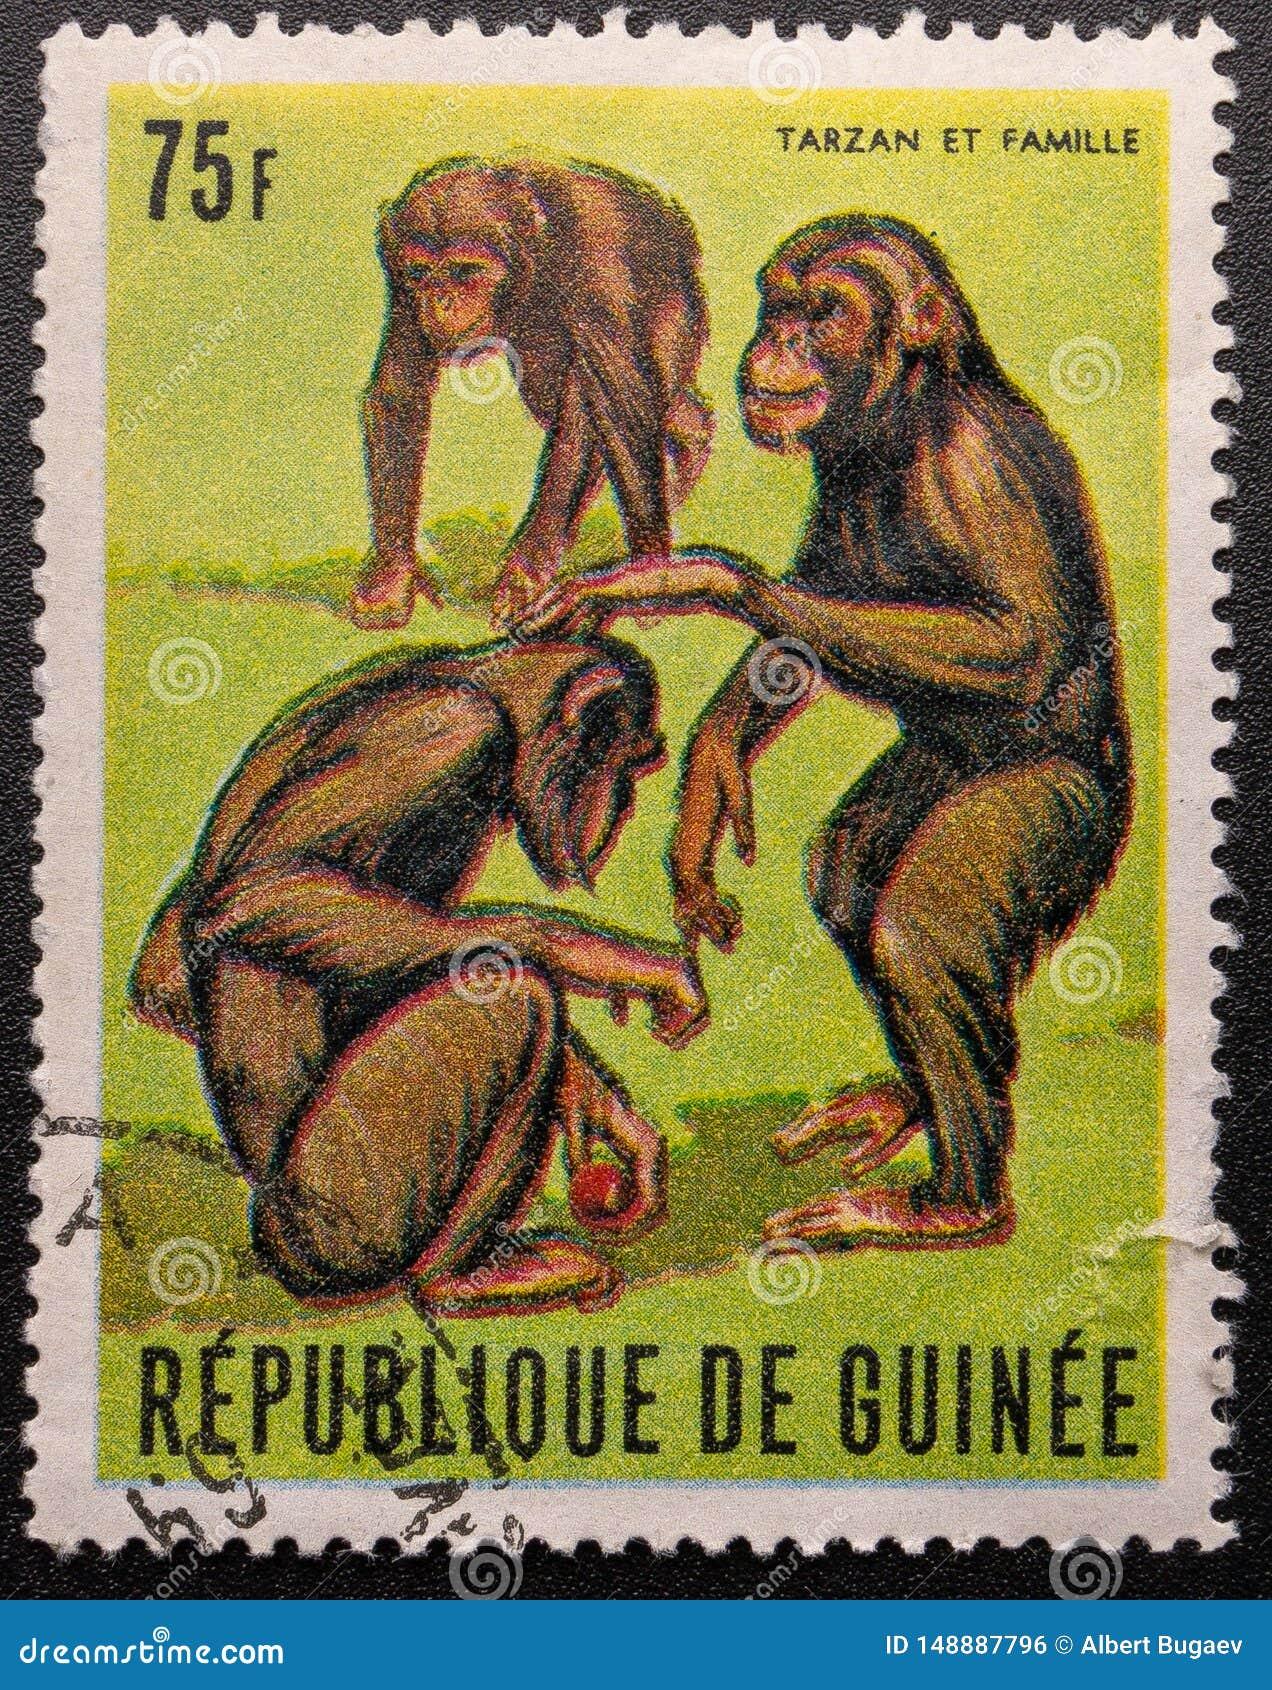 Postage Stamp. 1969. Republic of Guinea. Chimpanzee Tarzan